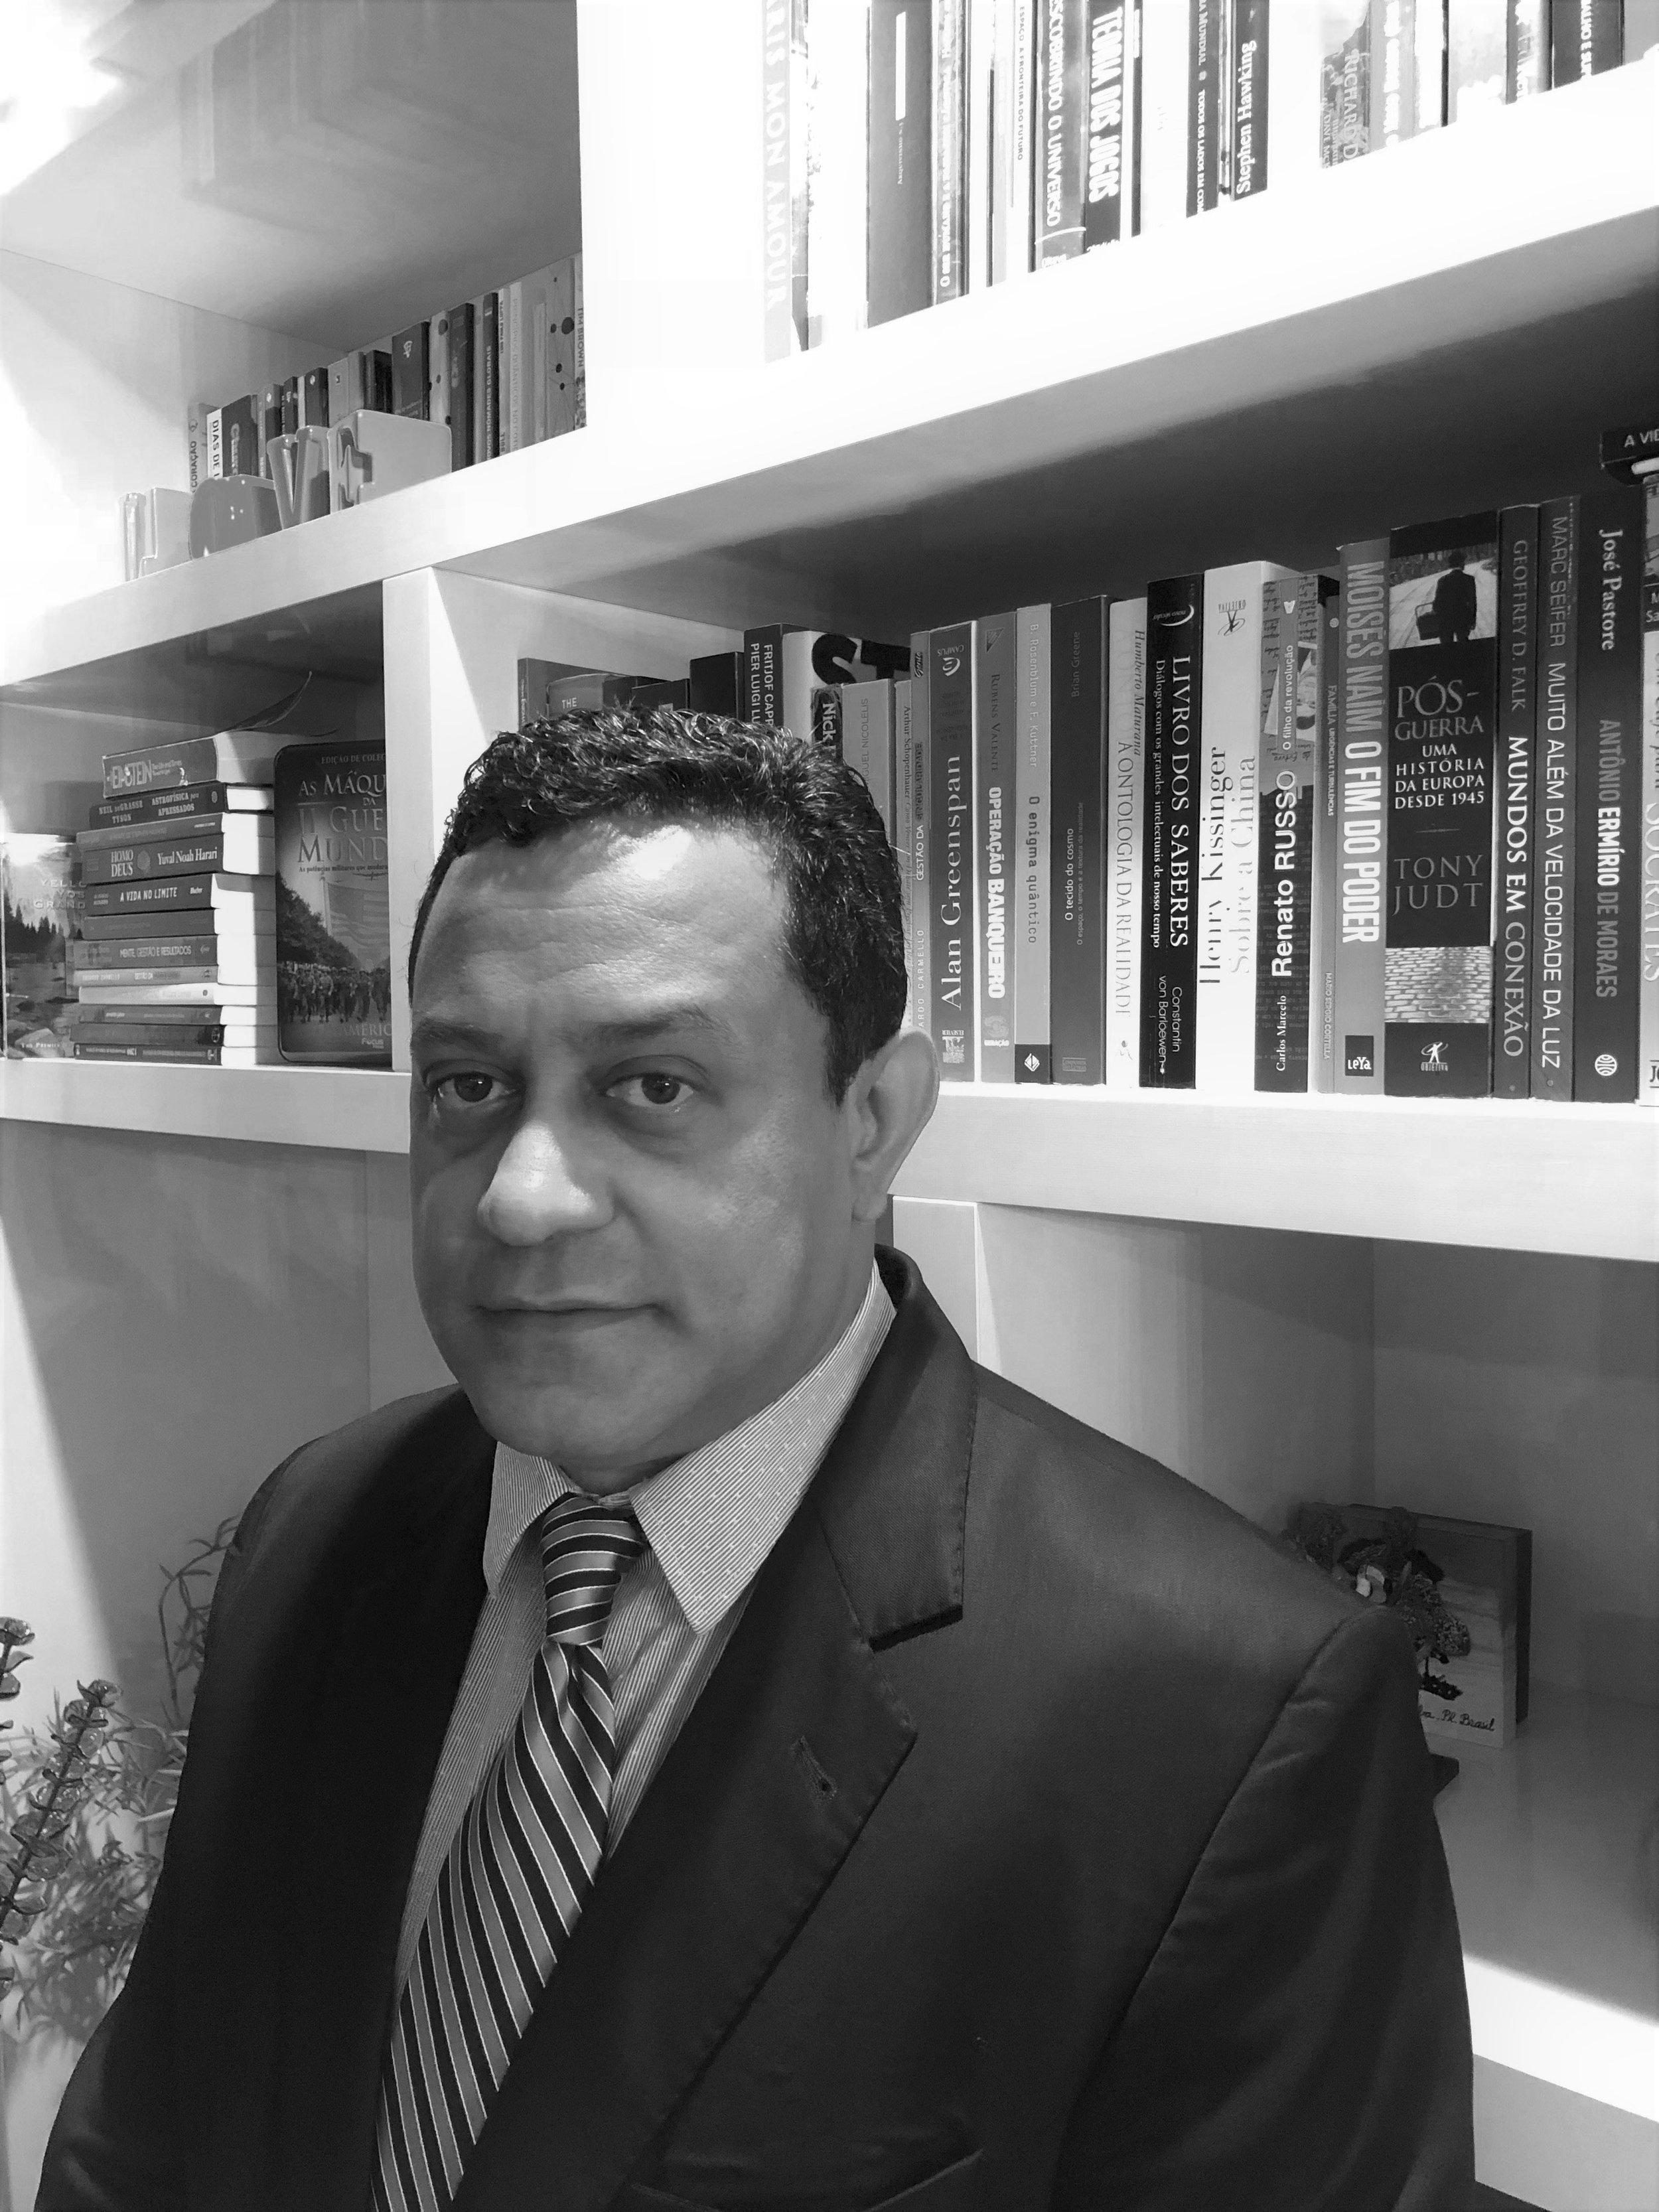 Alaim de Paula, Managing Director, Kappa Gears Consulting